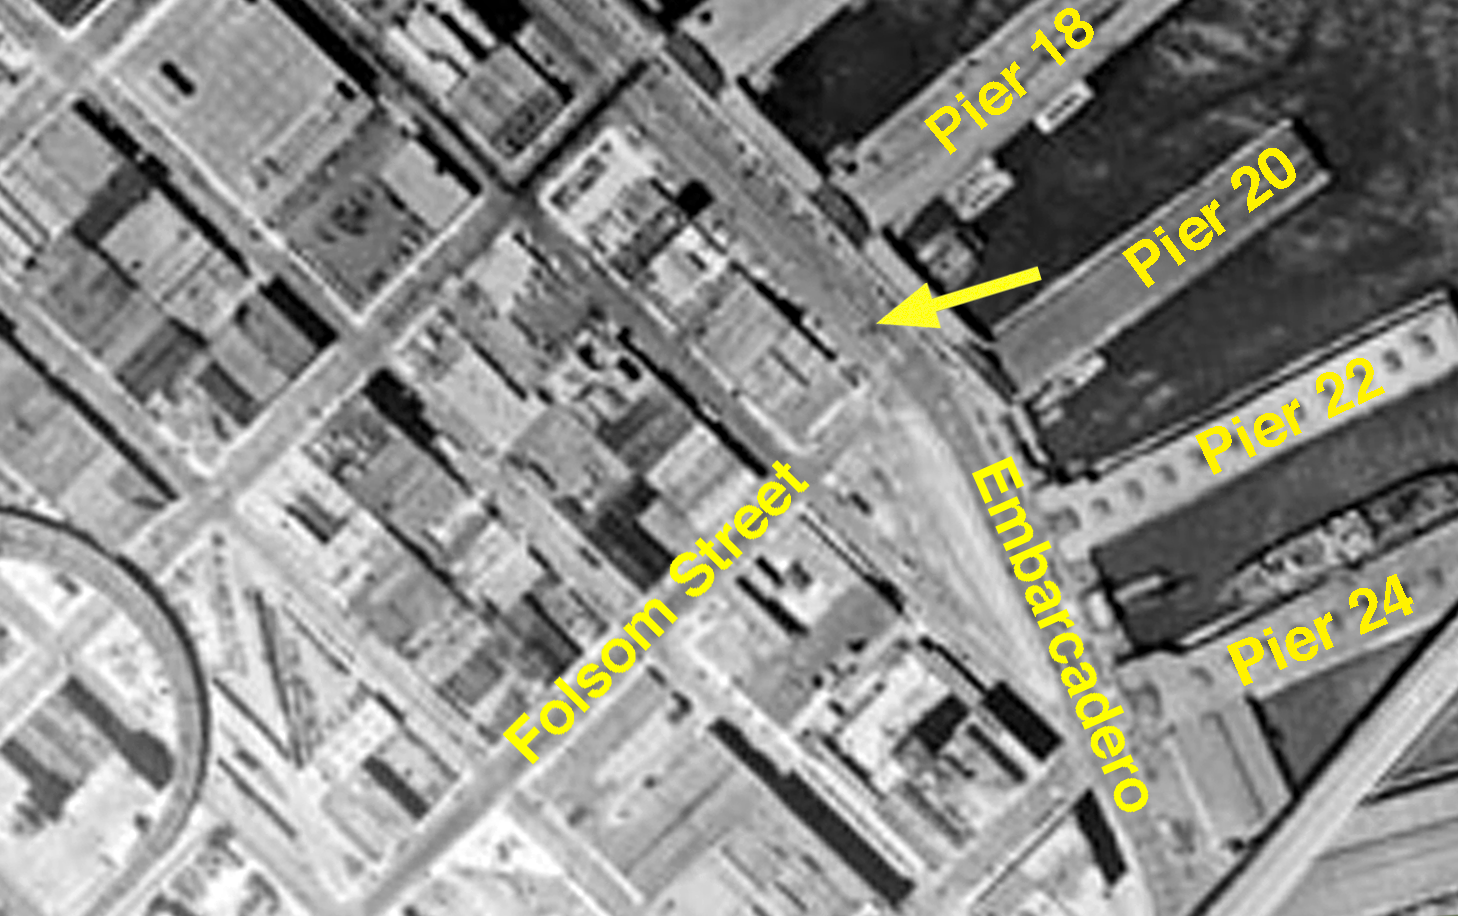 28 - showdown 2 aerial 1955.png